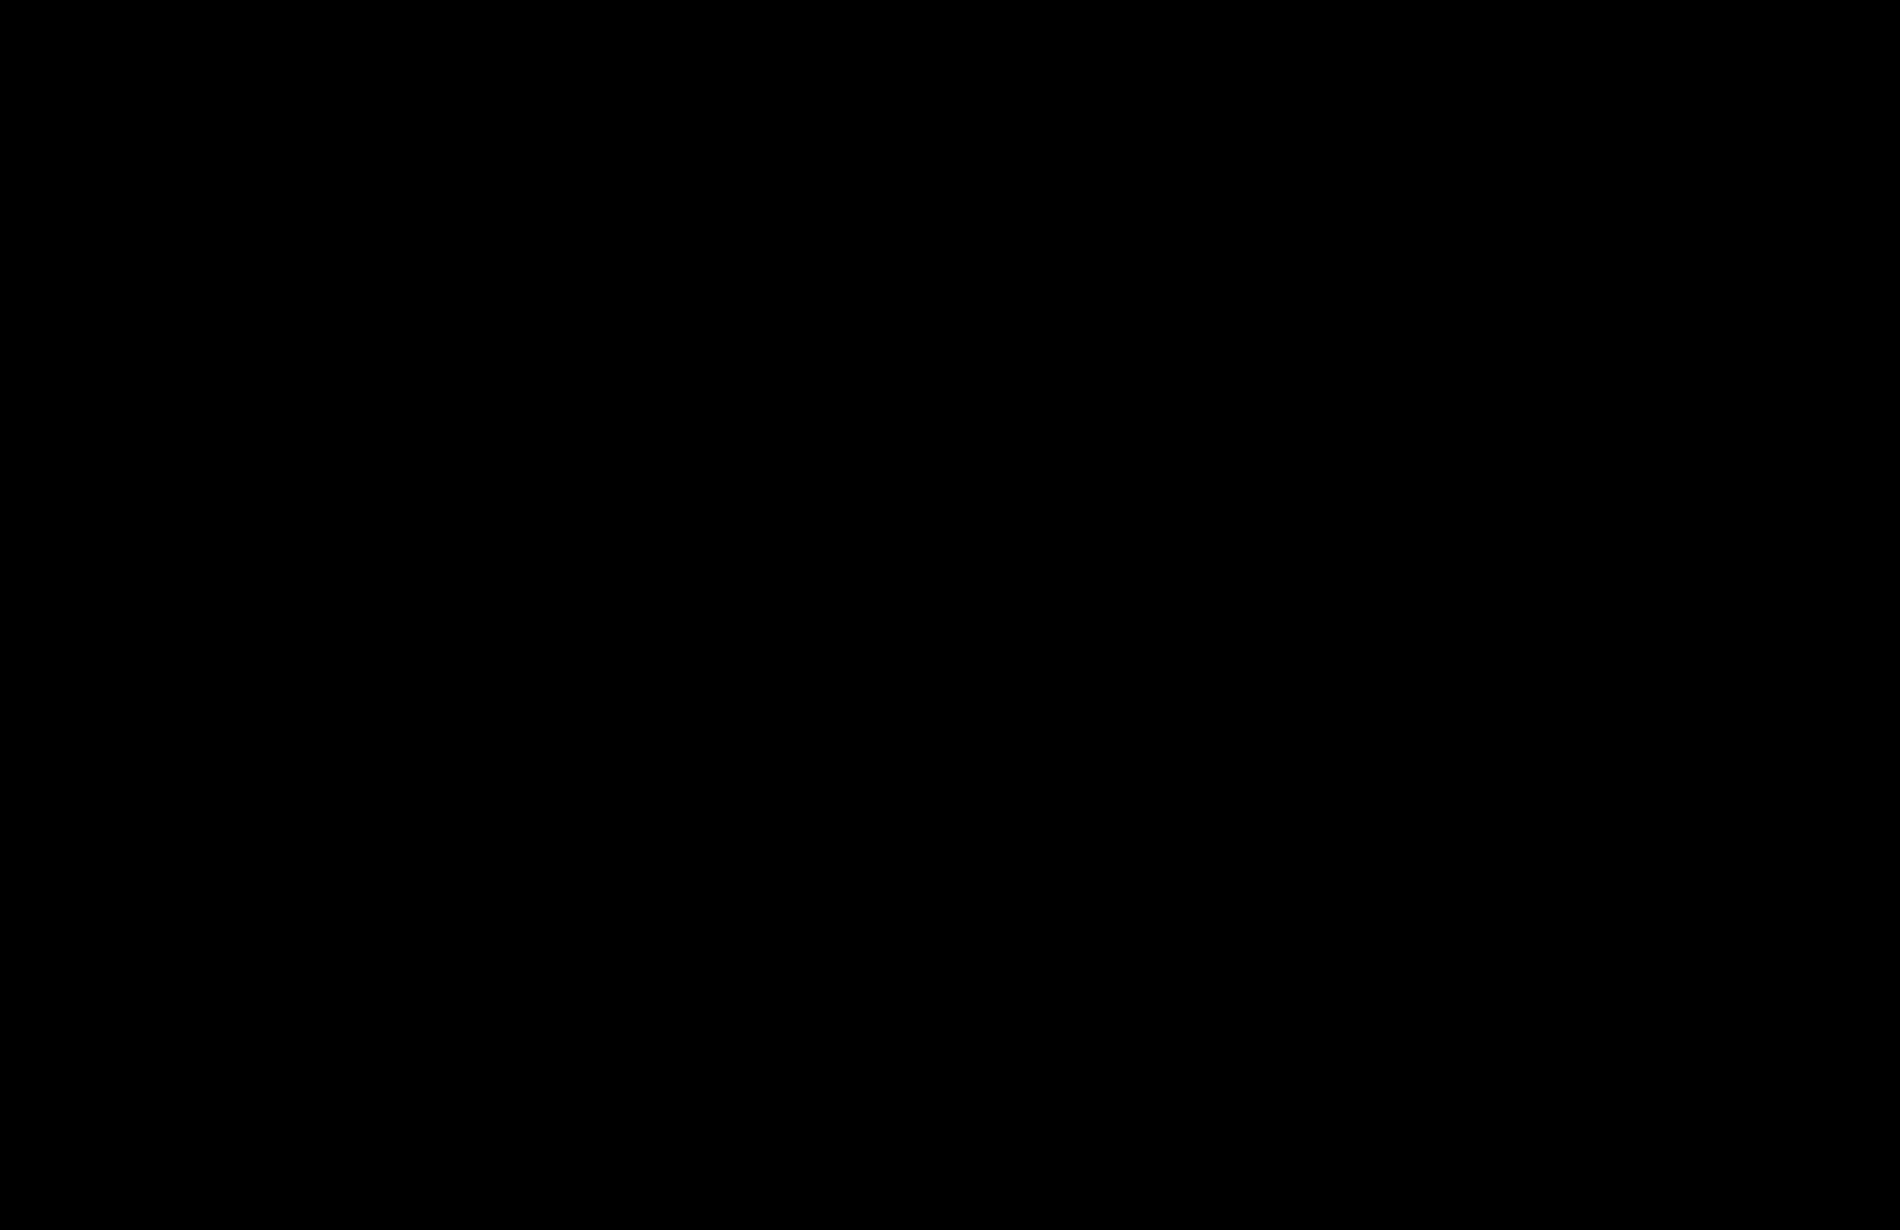 ۴۸۰۷۲۳_۴۲۲-compressor